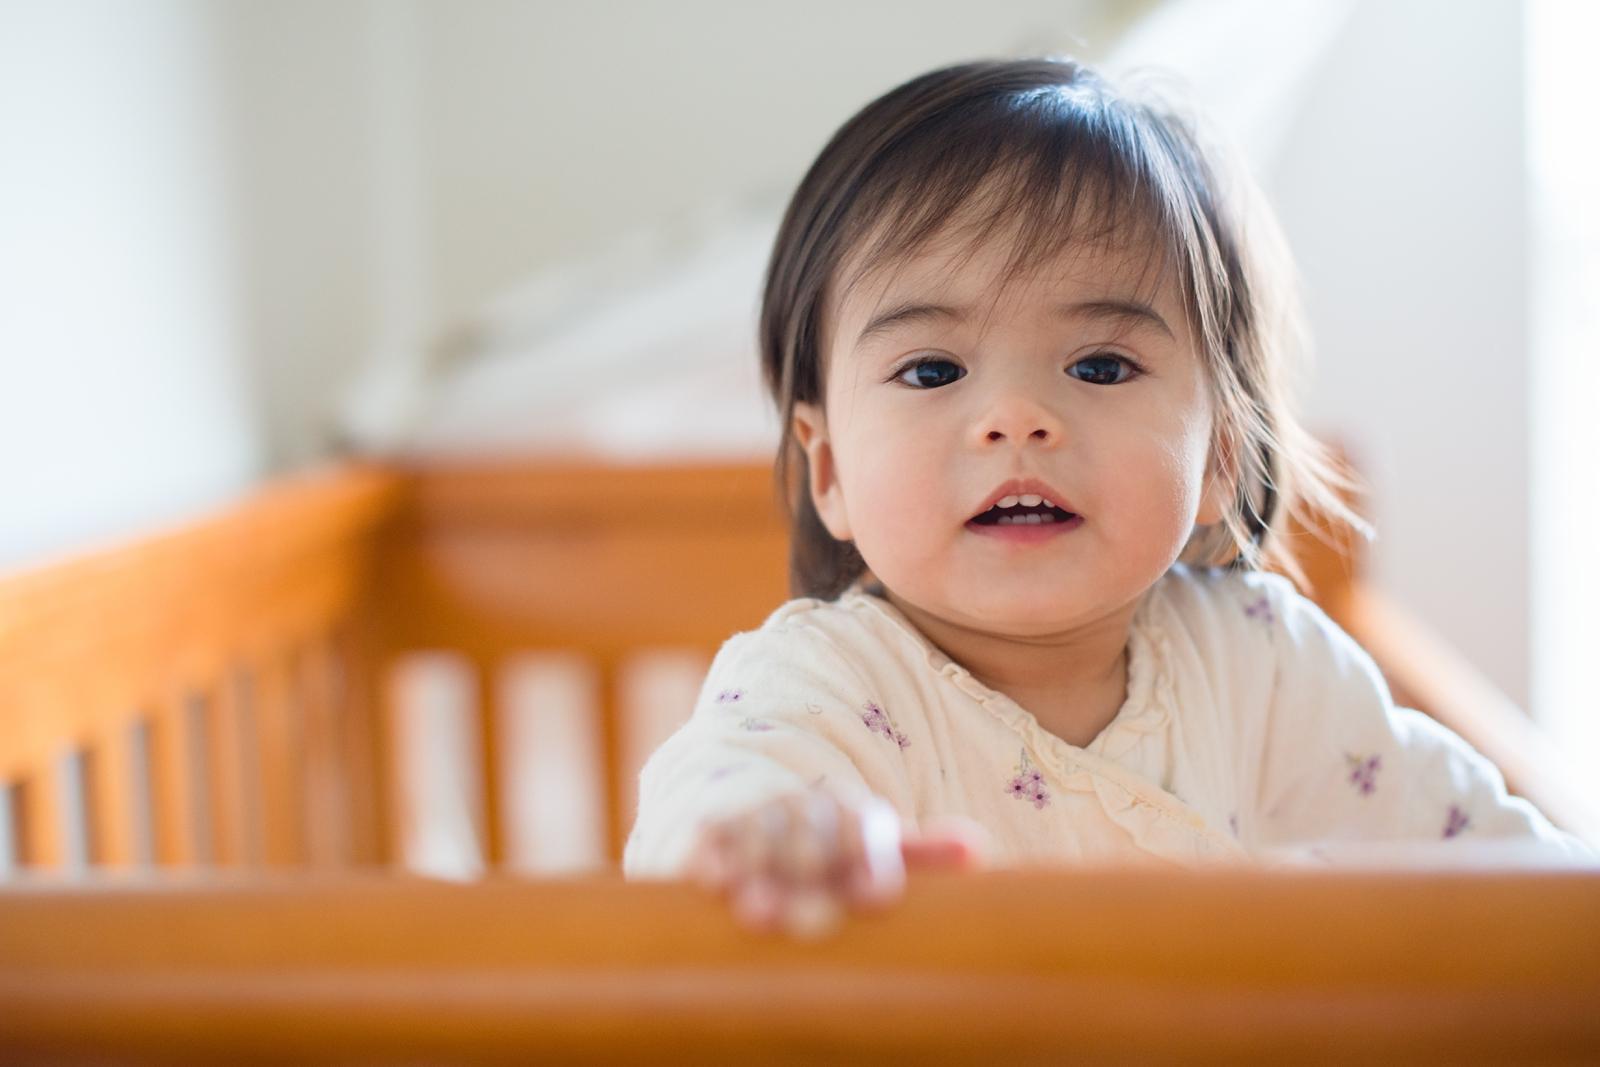 20130814-Amelia Stands in Crib-BLOGGrid_0015.jpg